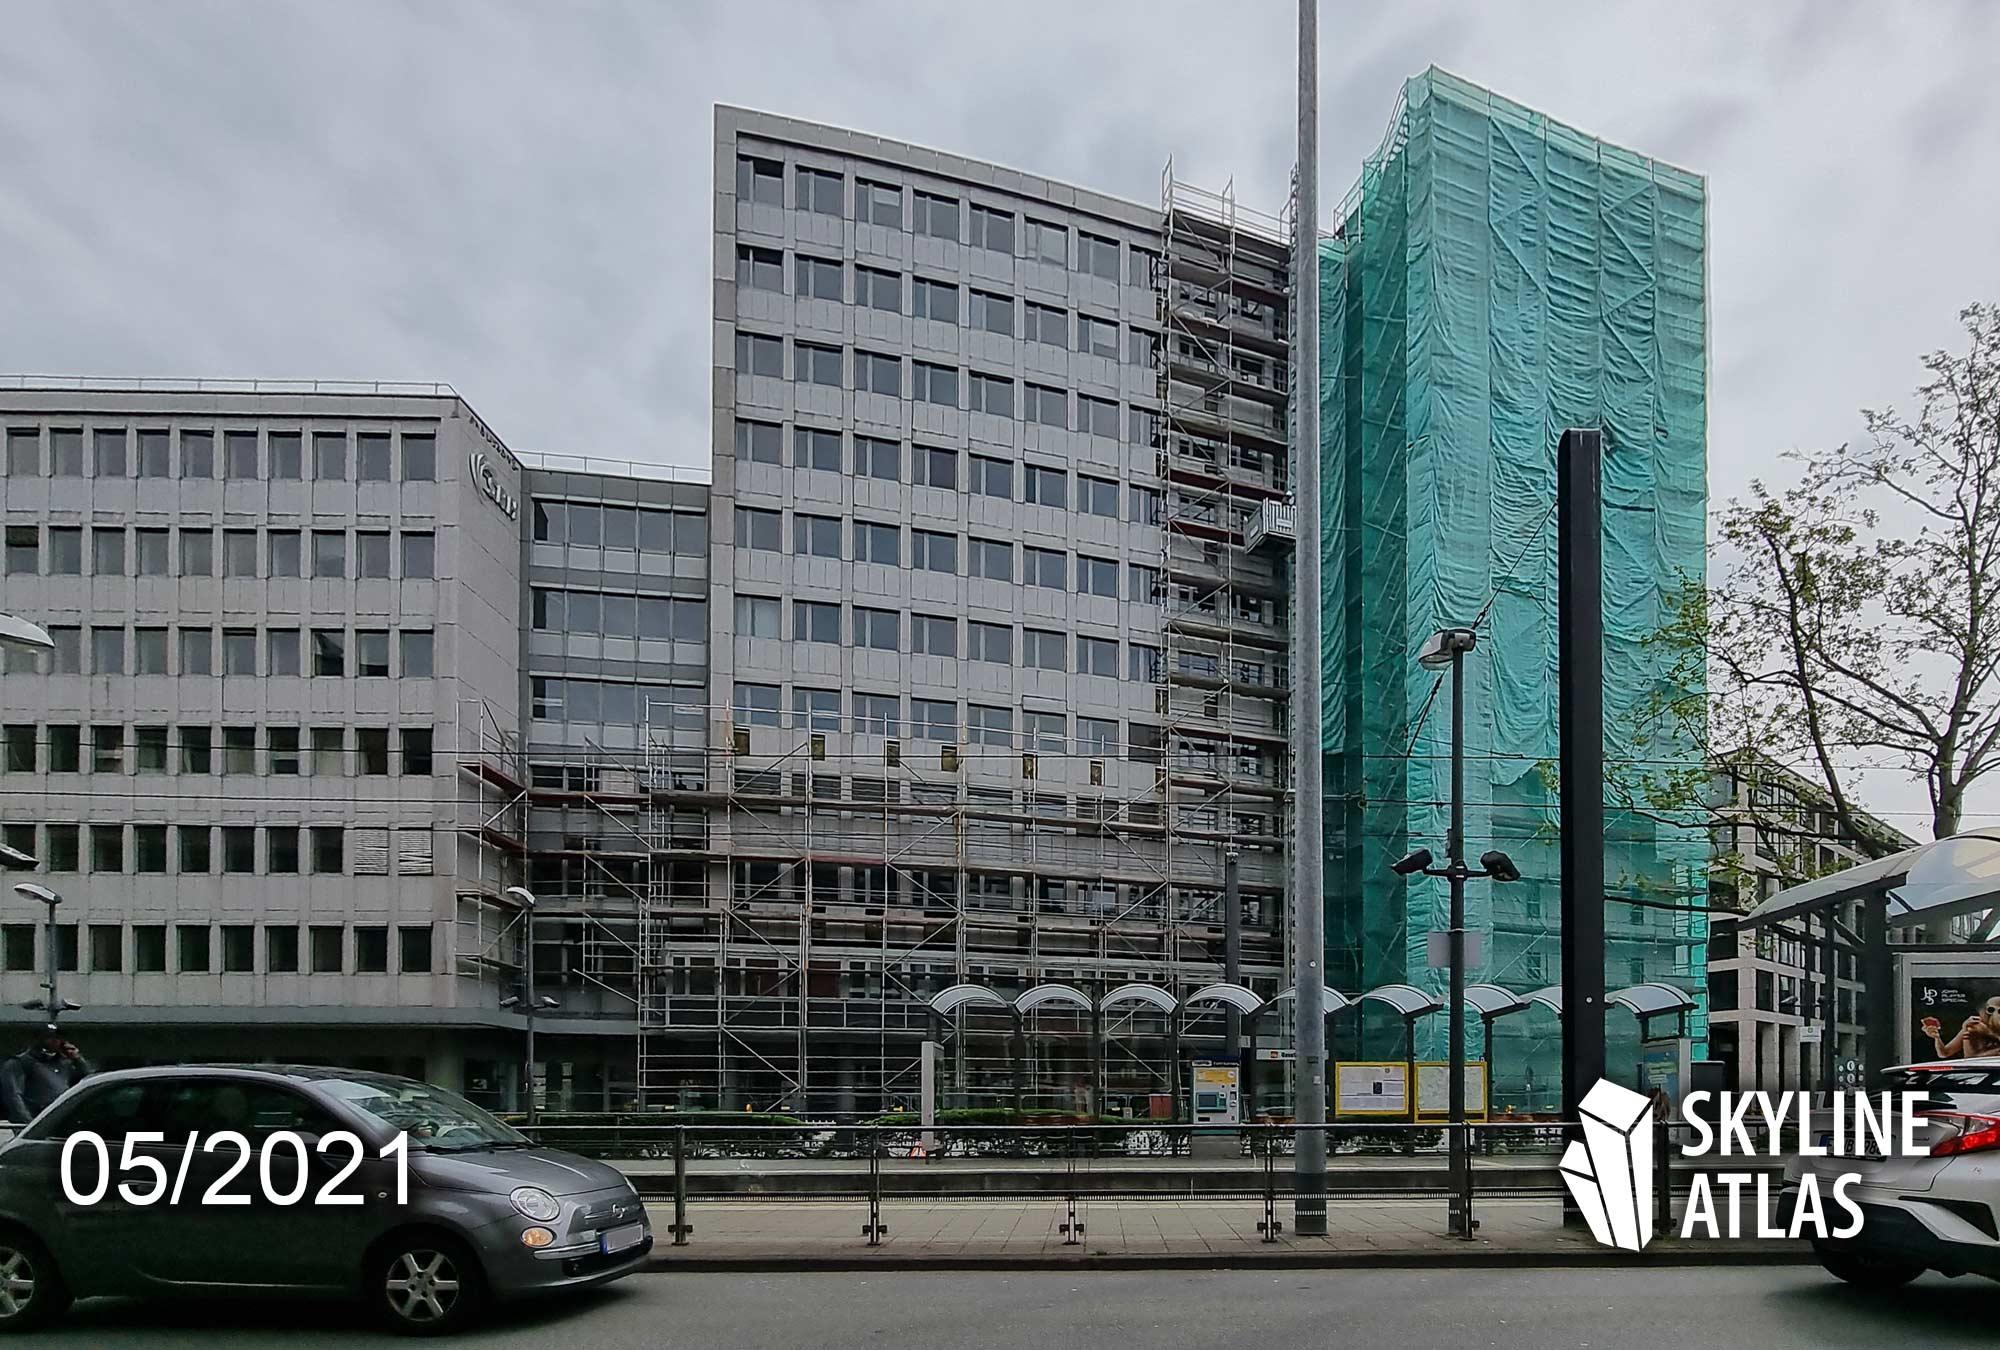 Gutleutstraße 82 Frankfurt - Kreisler Frankfurt am Main - Baustelle Mai 2021 - Rückbau Bürogebäude Frankfurt